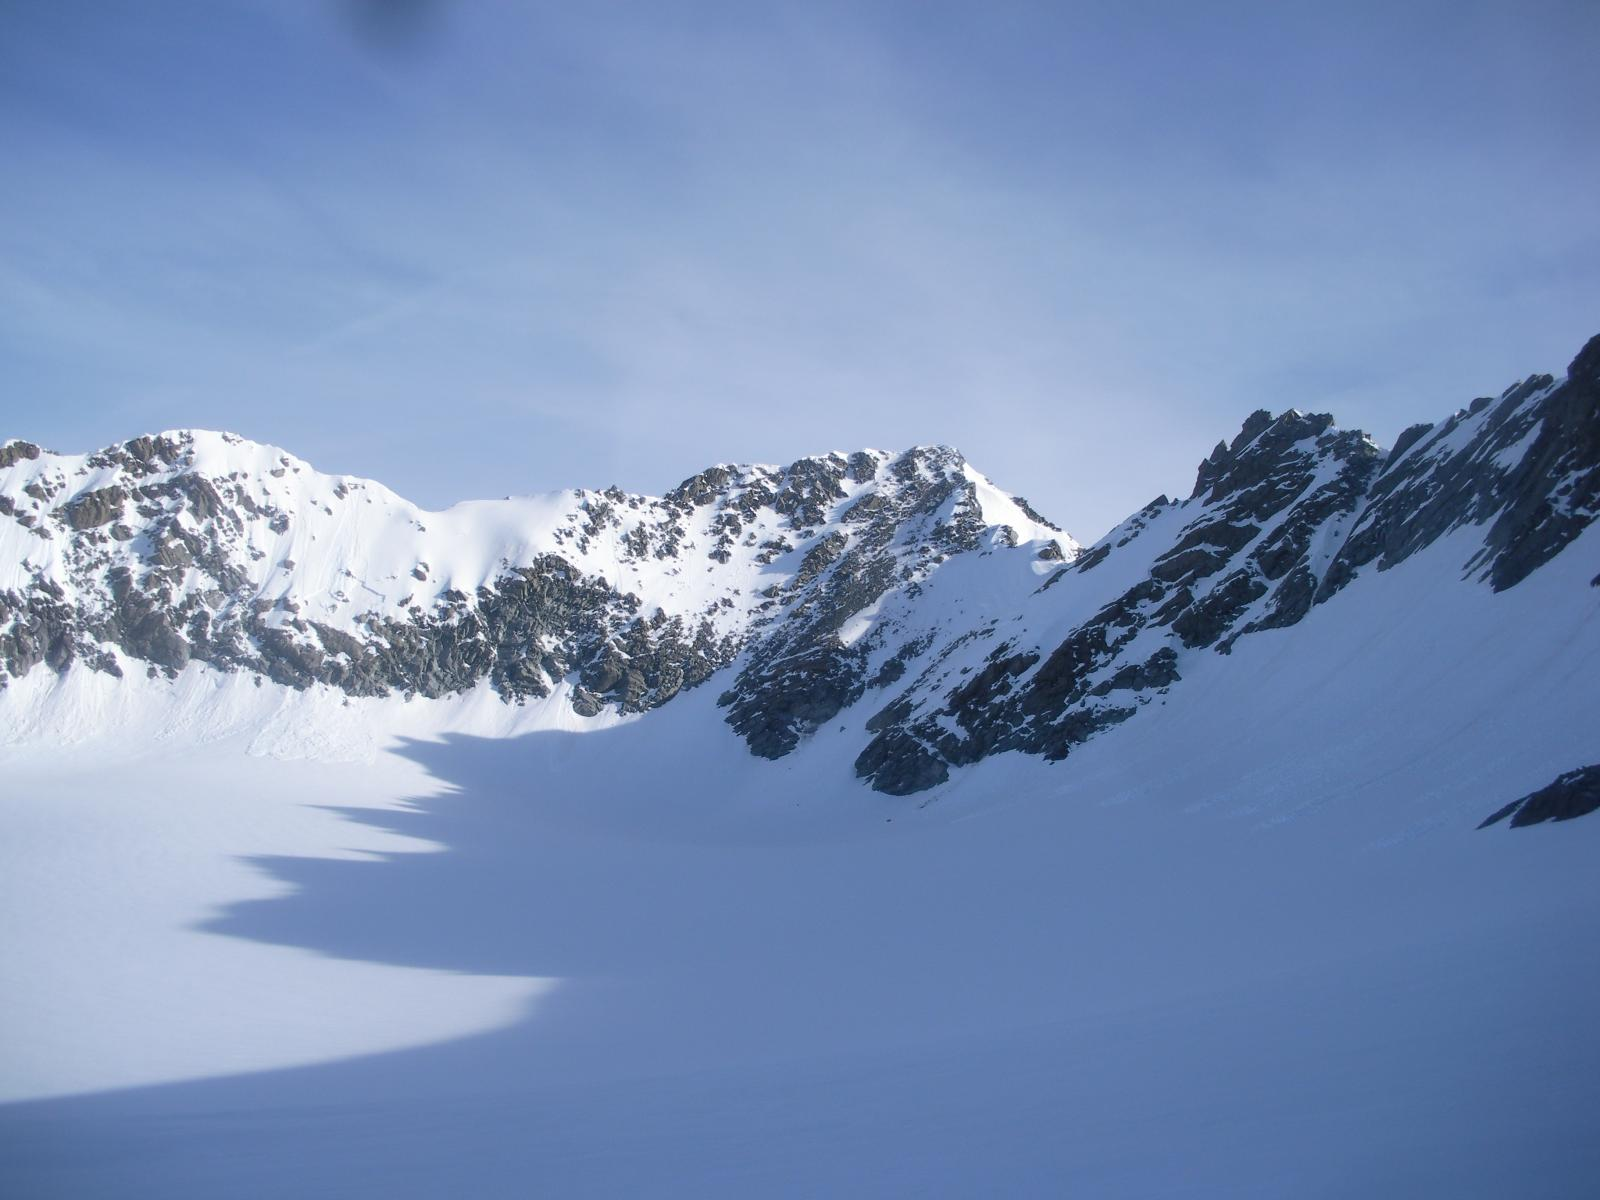 L'aig de Peclet al centro con a sx  il Roc des St-Peres e a dx il M.de Gebroulaz dal sommo del Glacier de Chaviere..